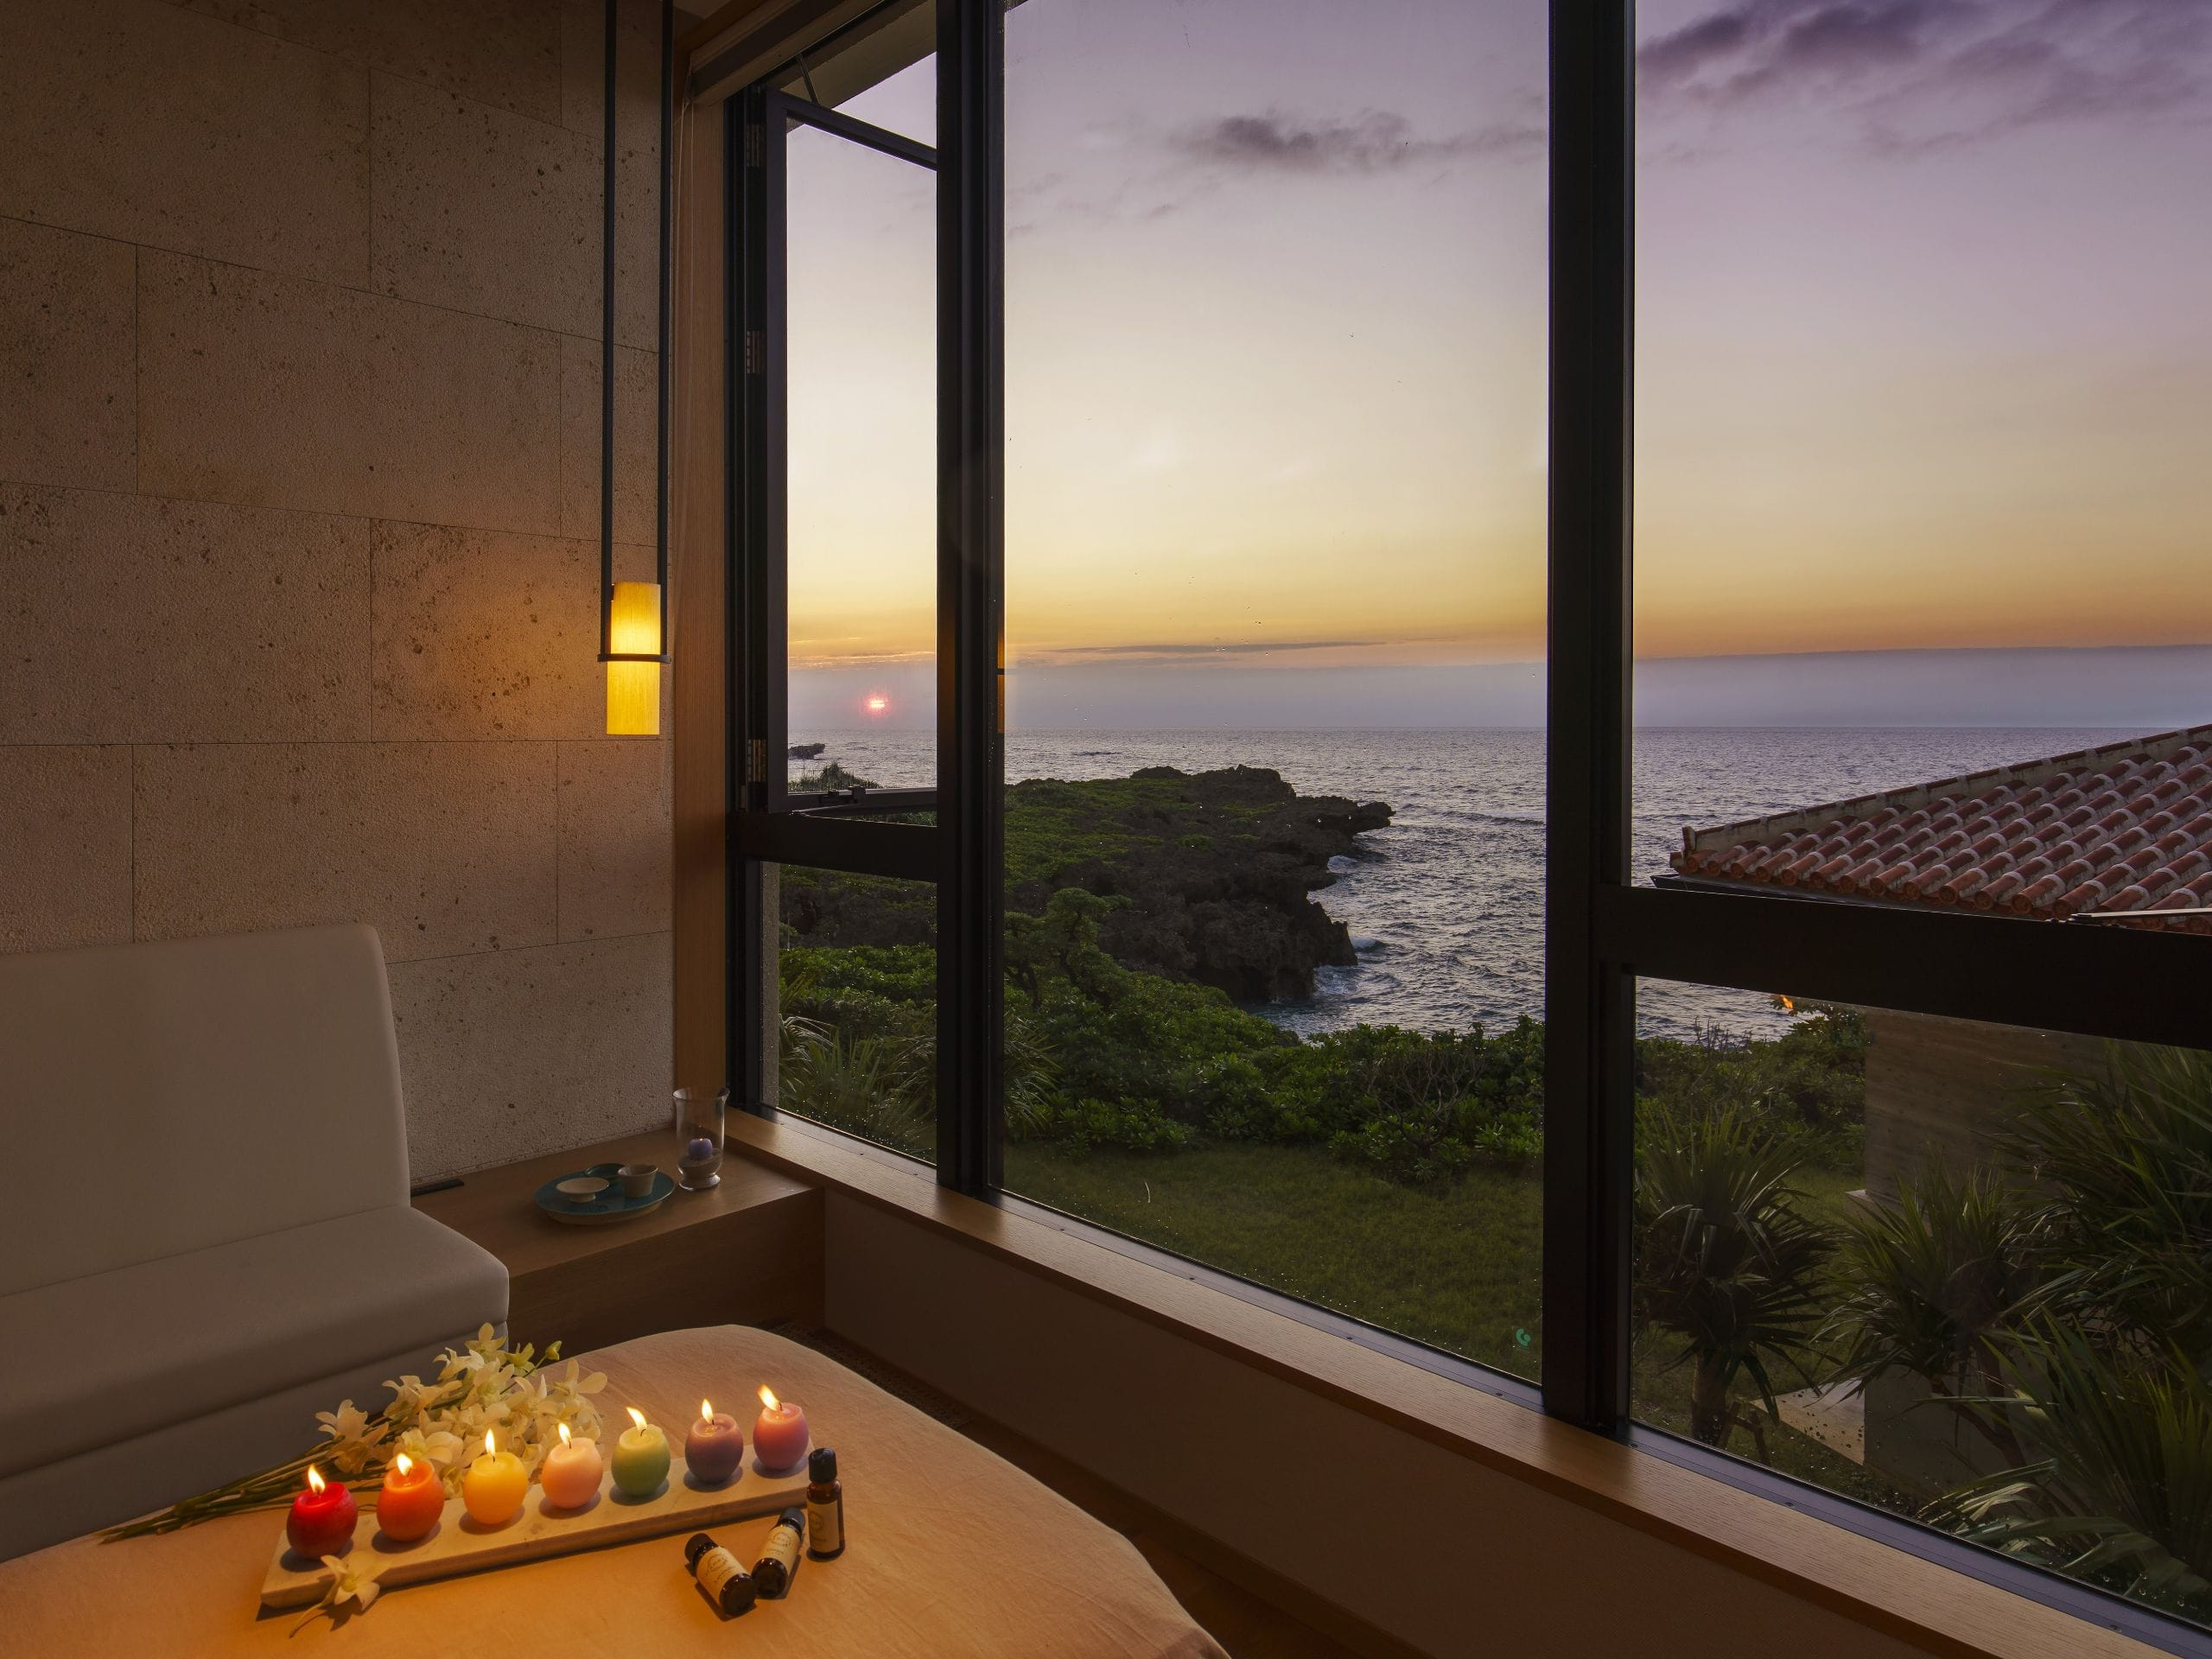 Hyatt Regency Seragaki Island Okinawa Spa hanari overview